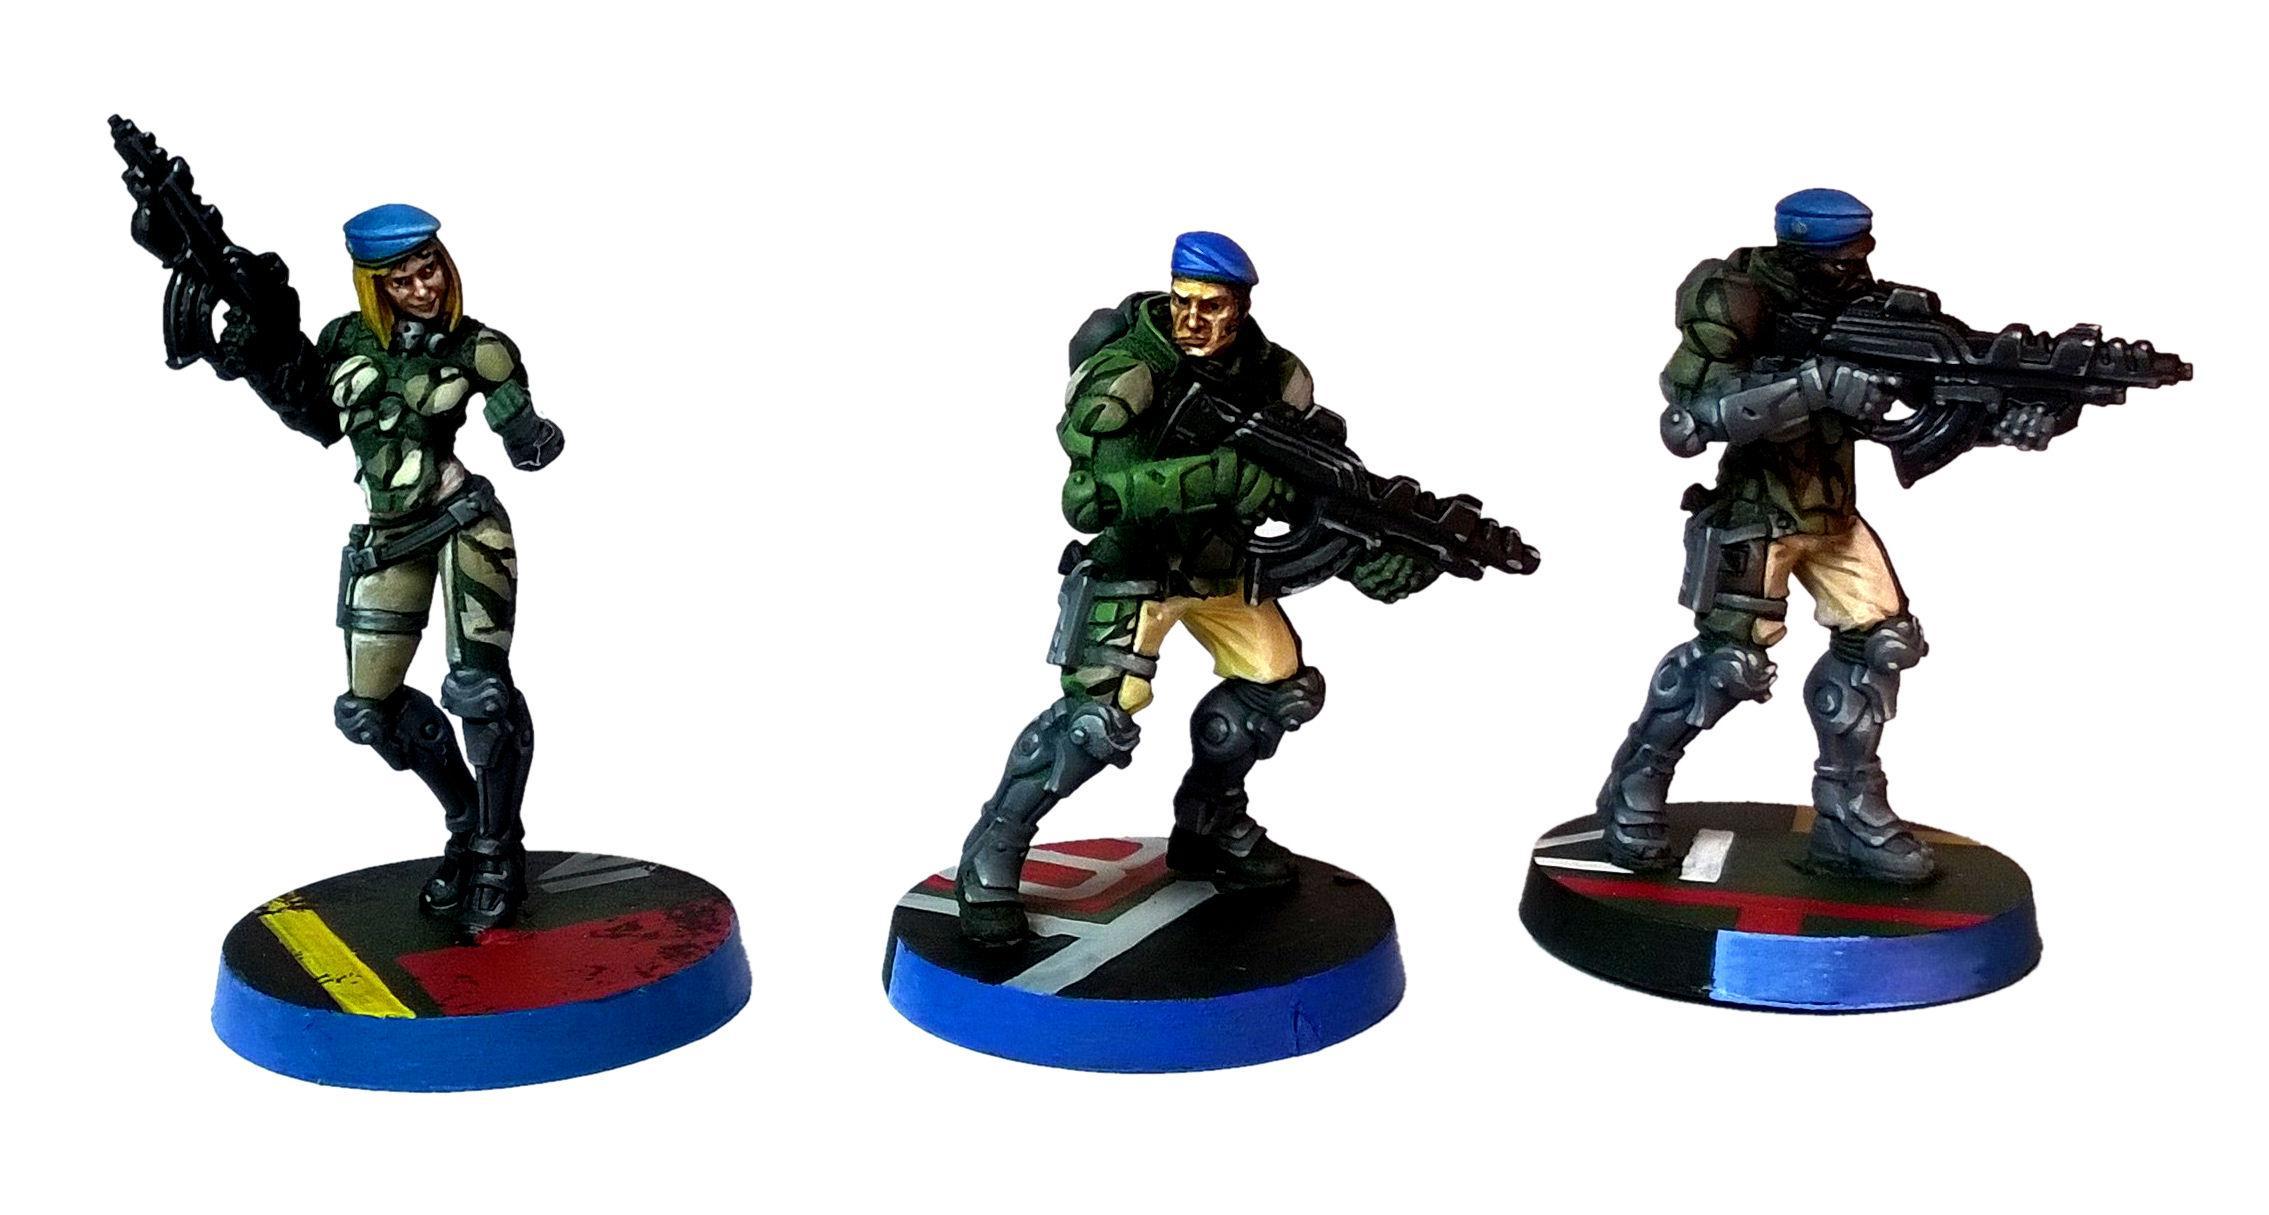 Belli, Camouflage, Corvus, Fusliers, Infinity, Panoceania